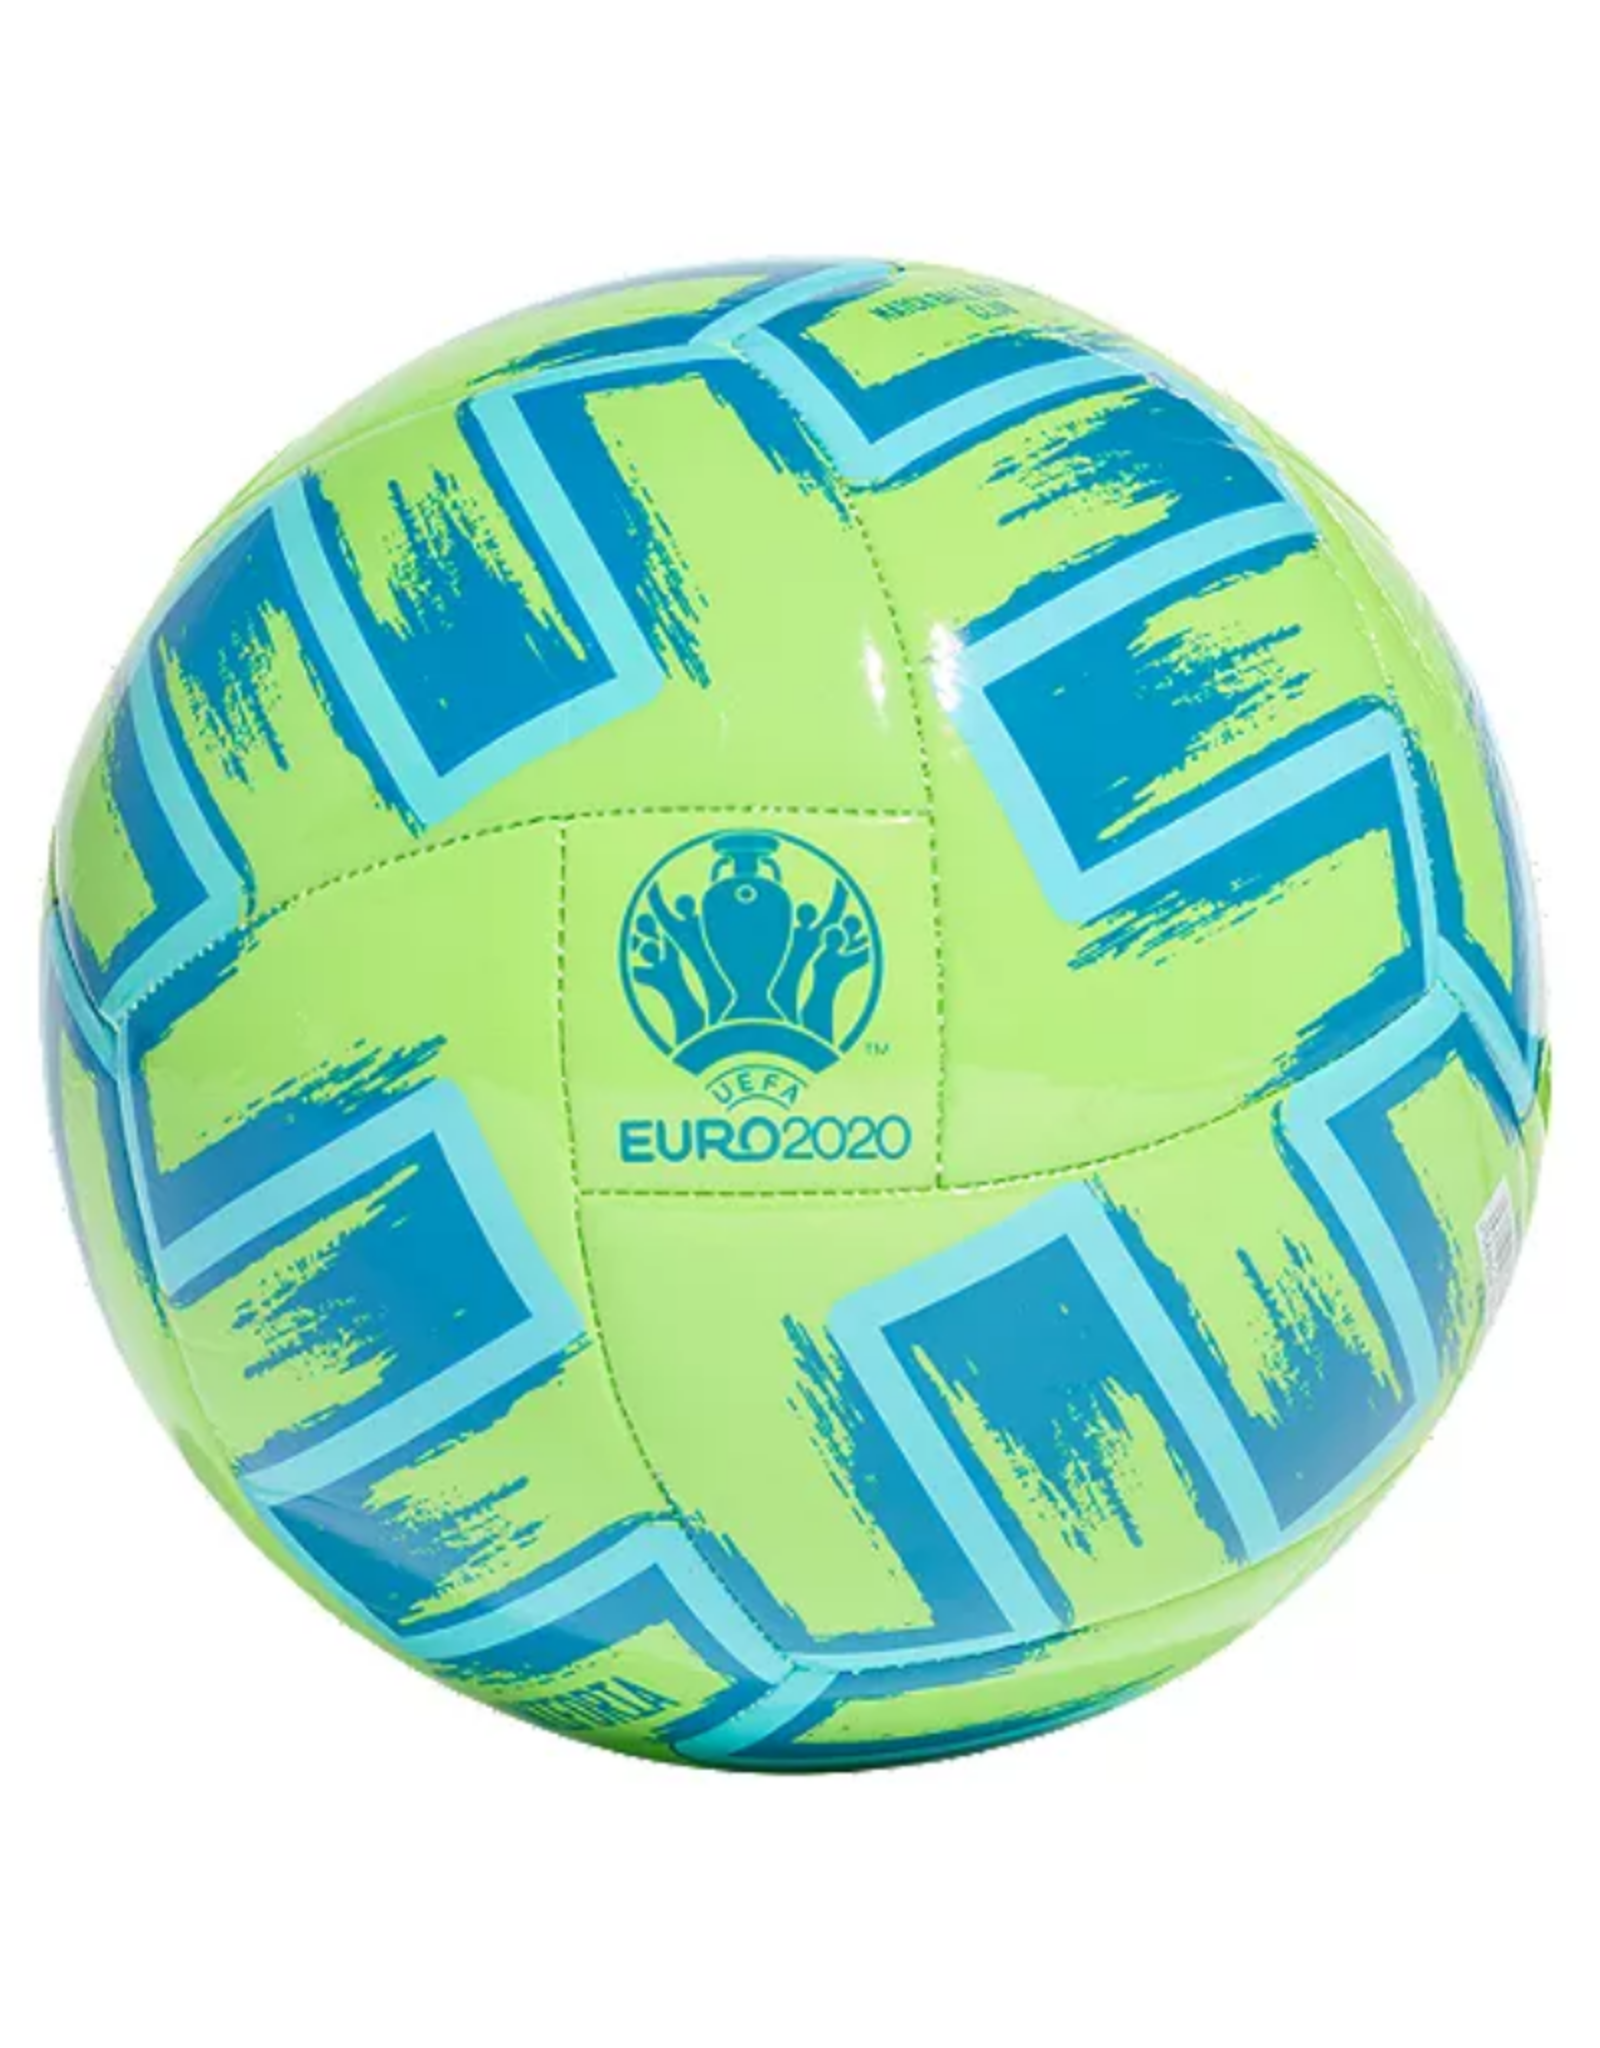 Adidas Adidas Euro 2020 Uniforia Club Soccer Ball Size 4 Green